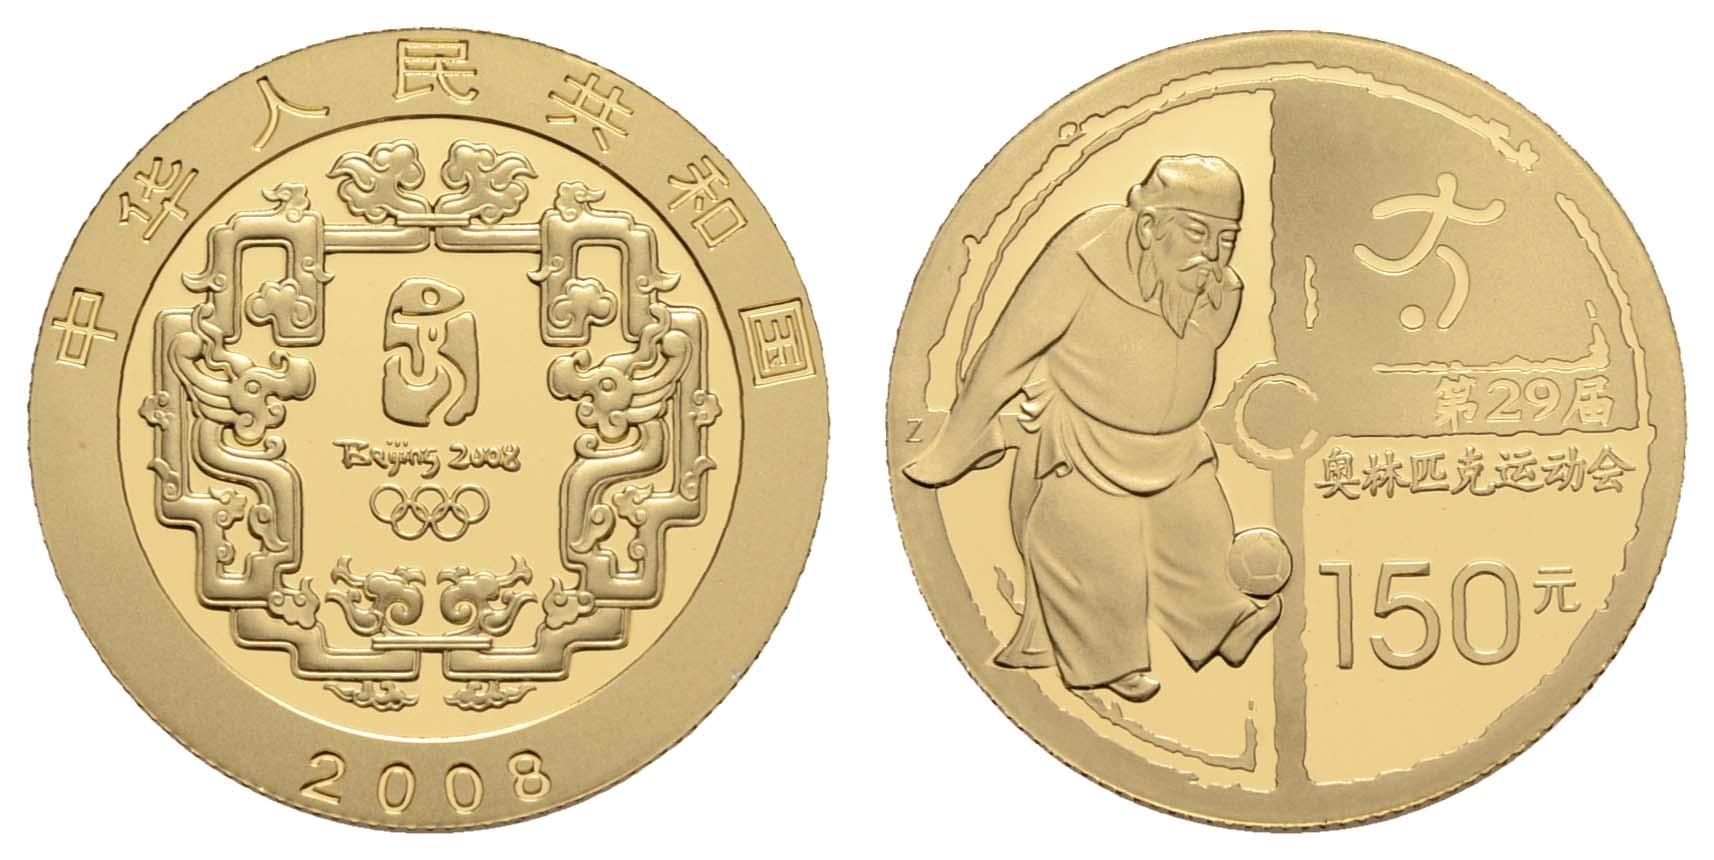 Lot 1921 - übersee China -  Auktionshaus Ulrich Felzmann GmbH & Co. KG Coins single lots